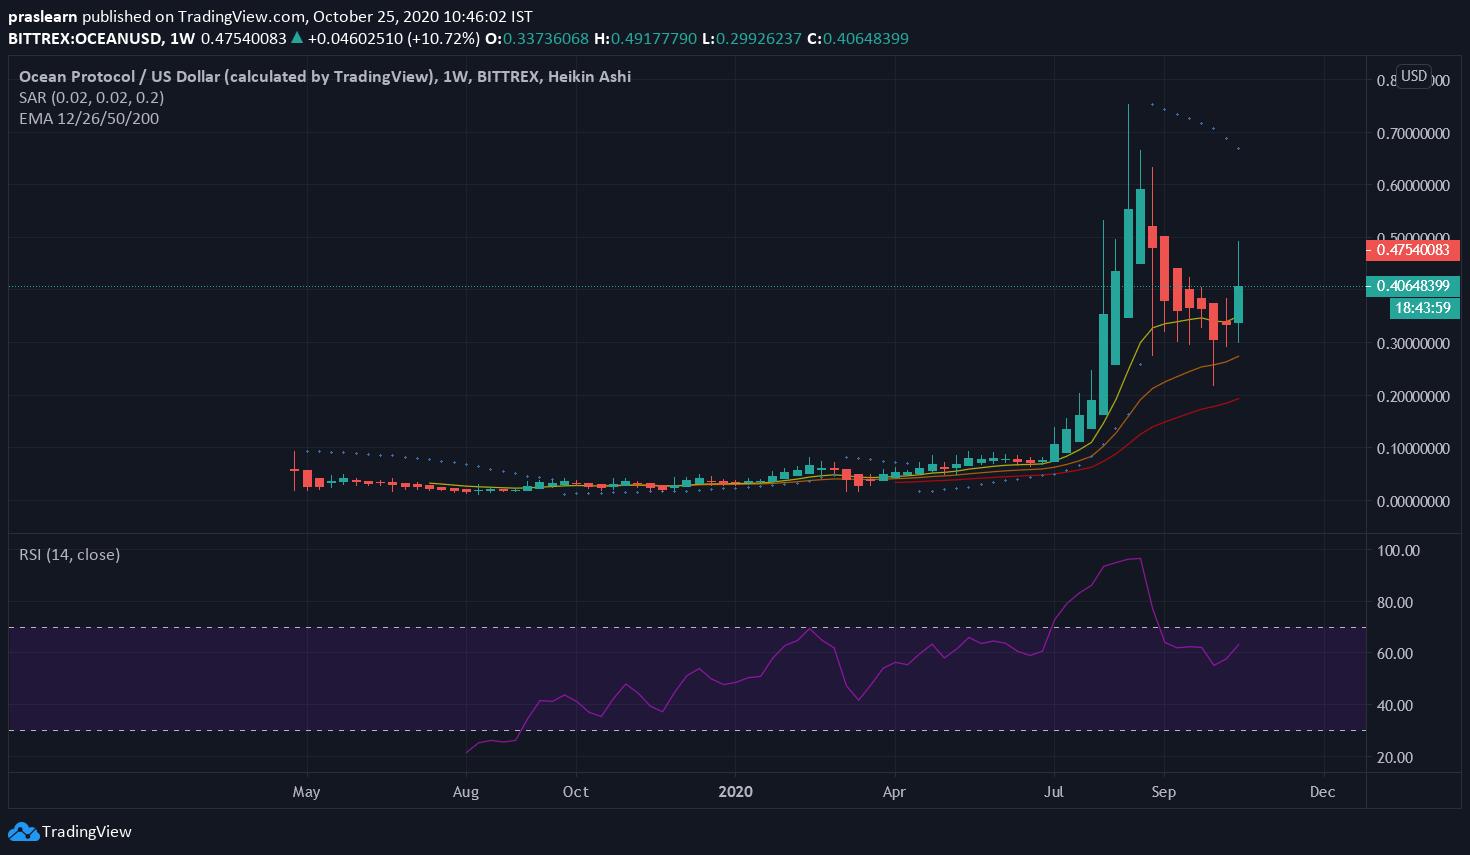 OCEAN/USD Weekly Chart: Tradingview